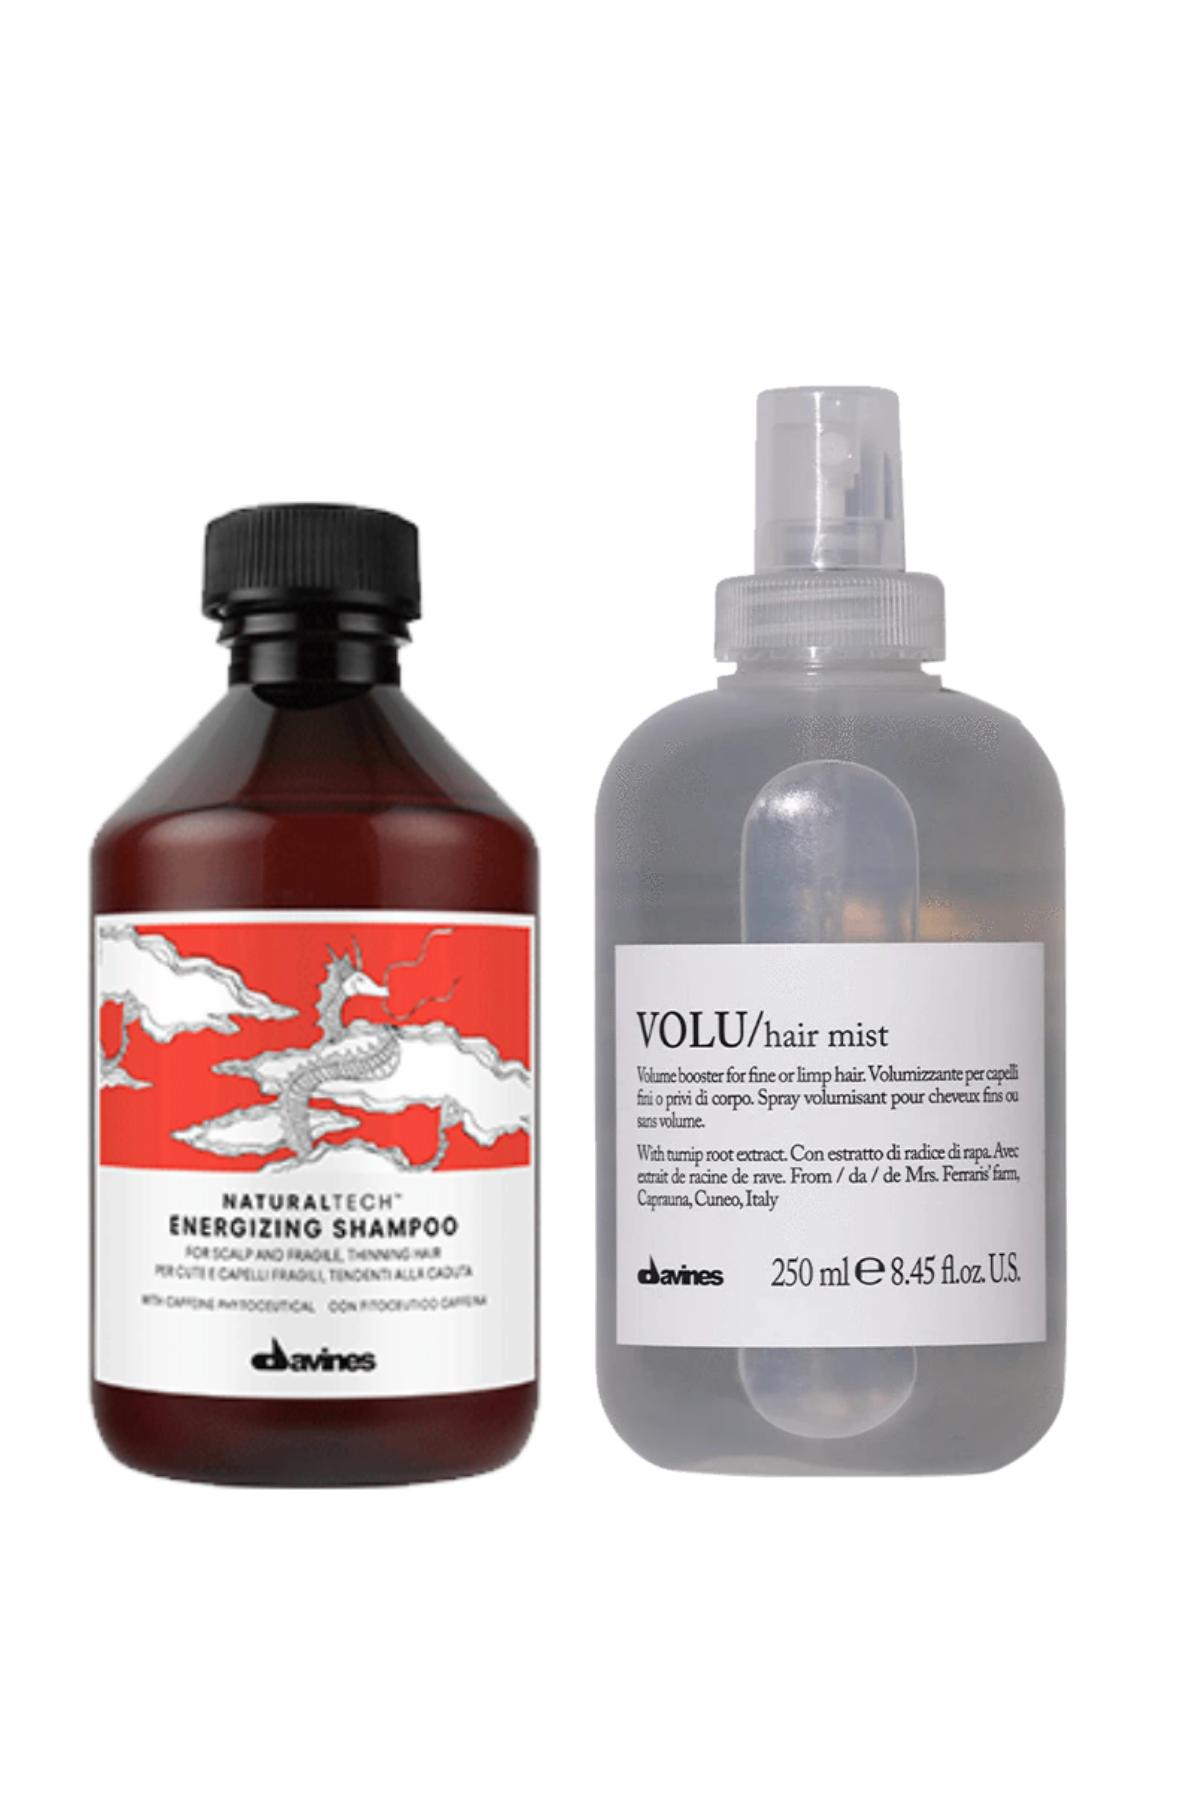 Davines Energizing Şampuan 250 ml + Davines Volu Hair Misk 250 ml